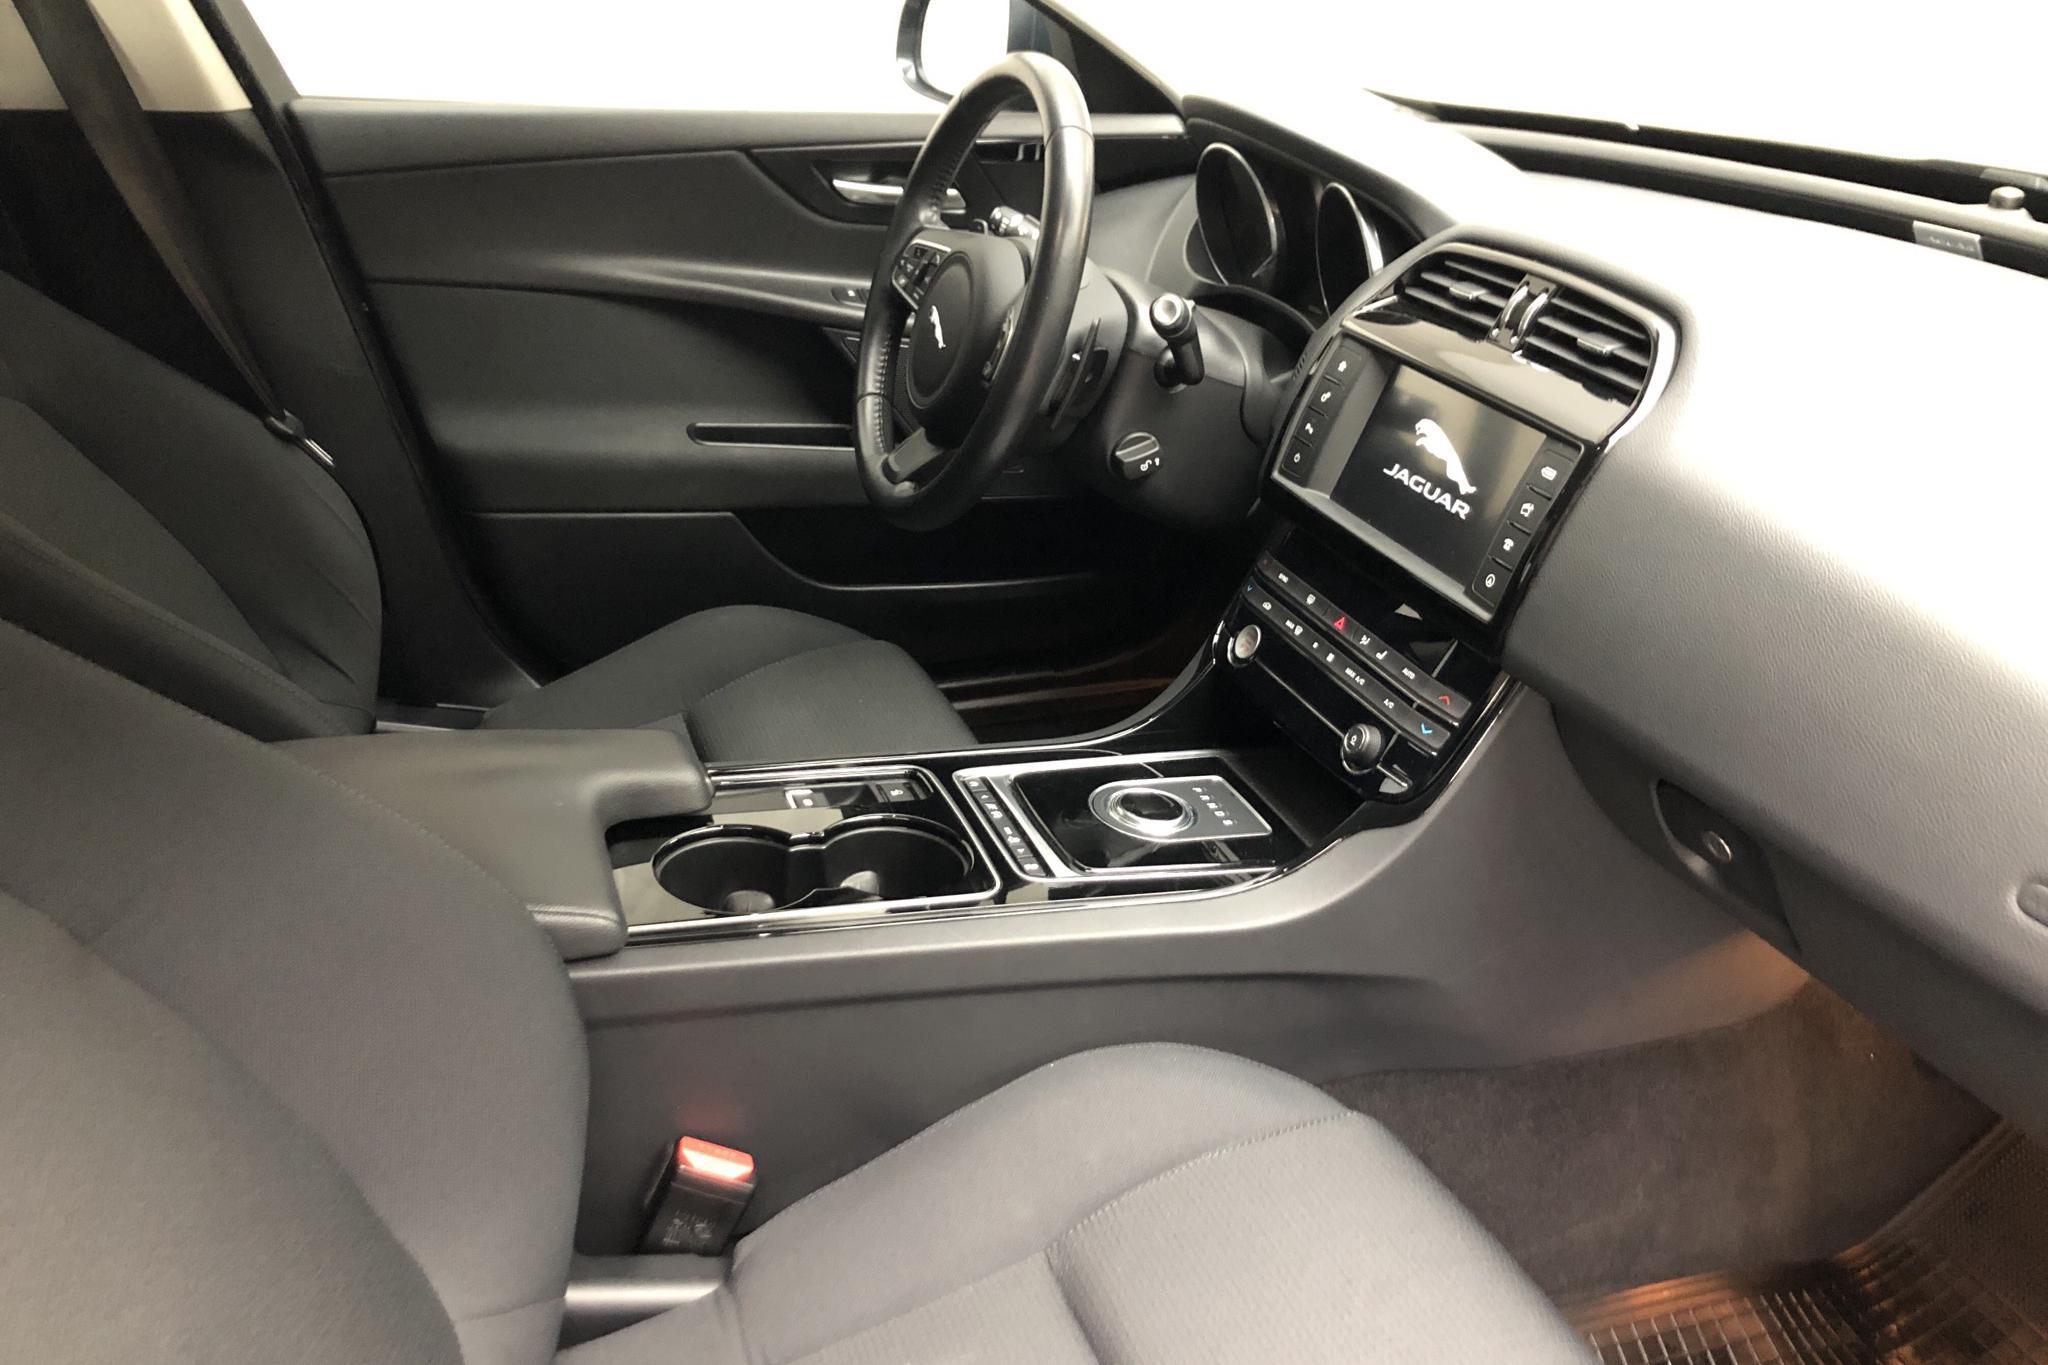 Jaguar XE 2.0D (180hk) - 58 930 km - Automatic - green - 2017